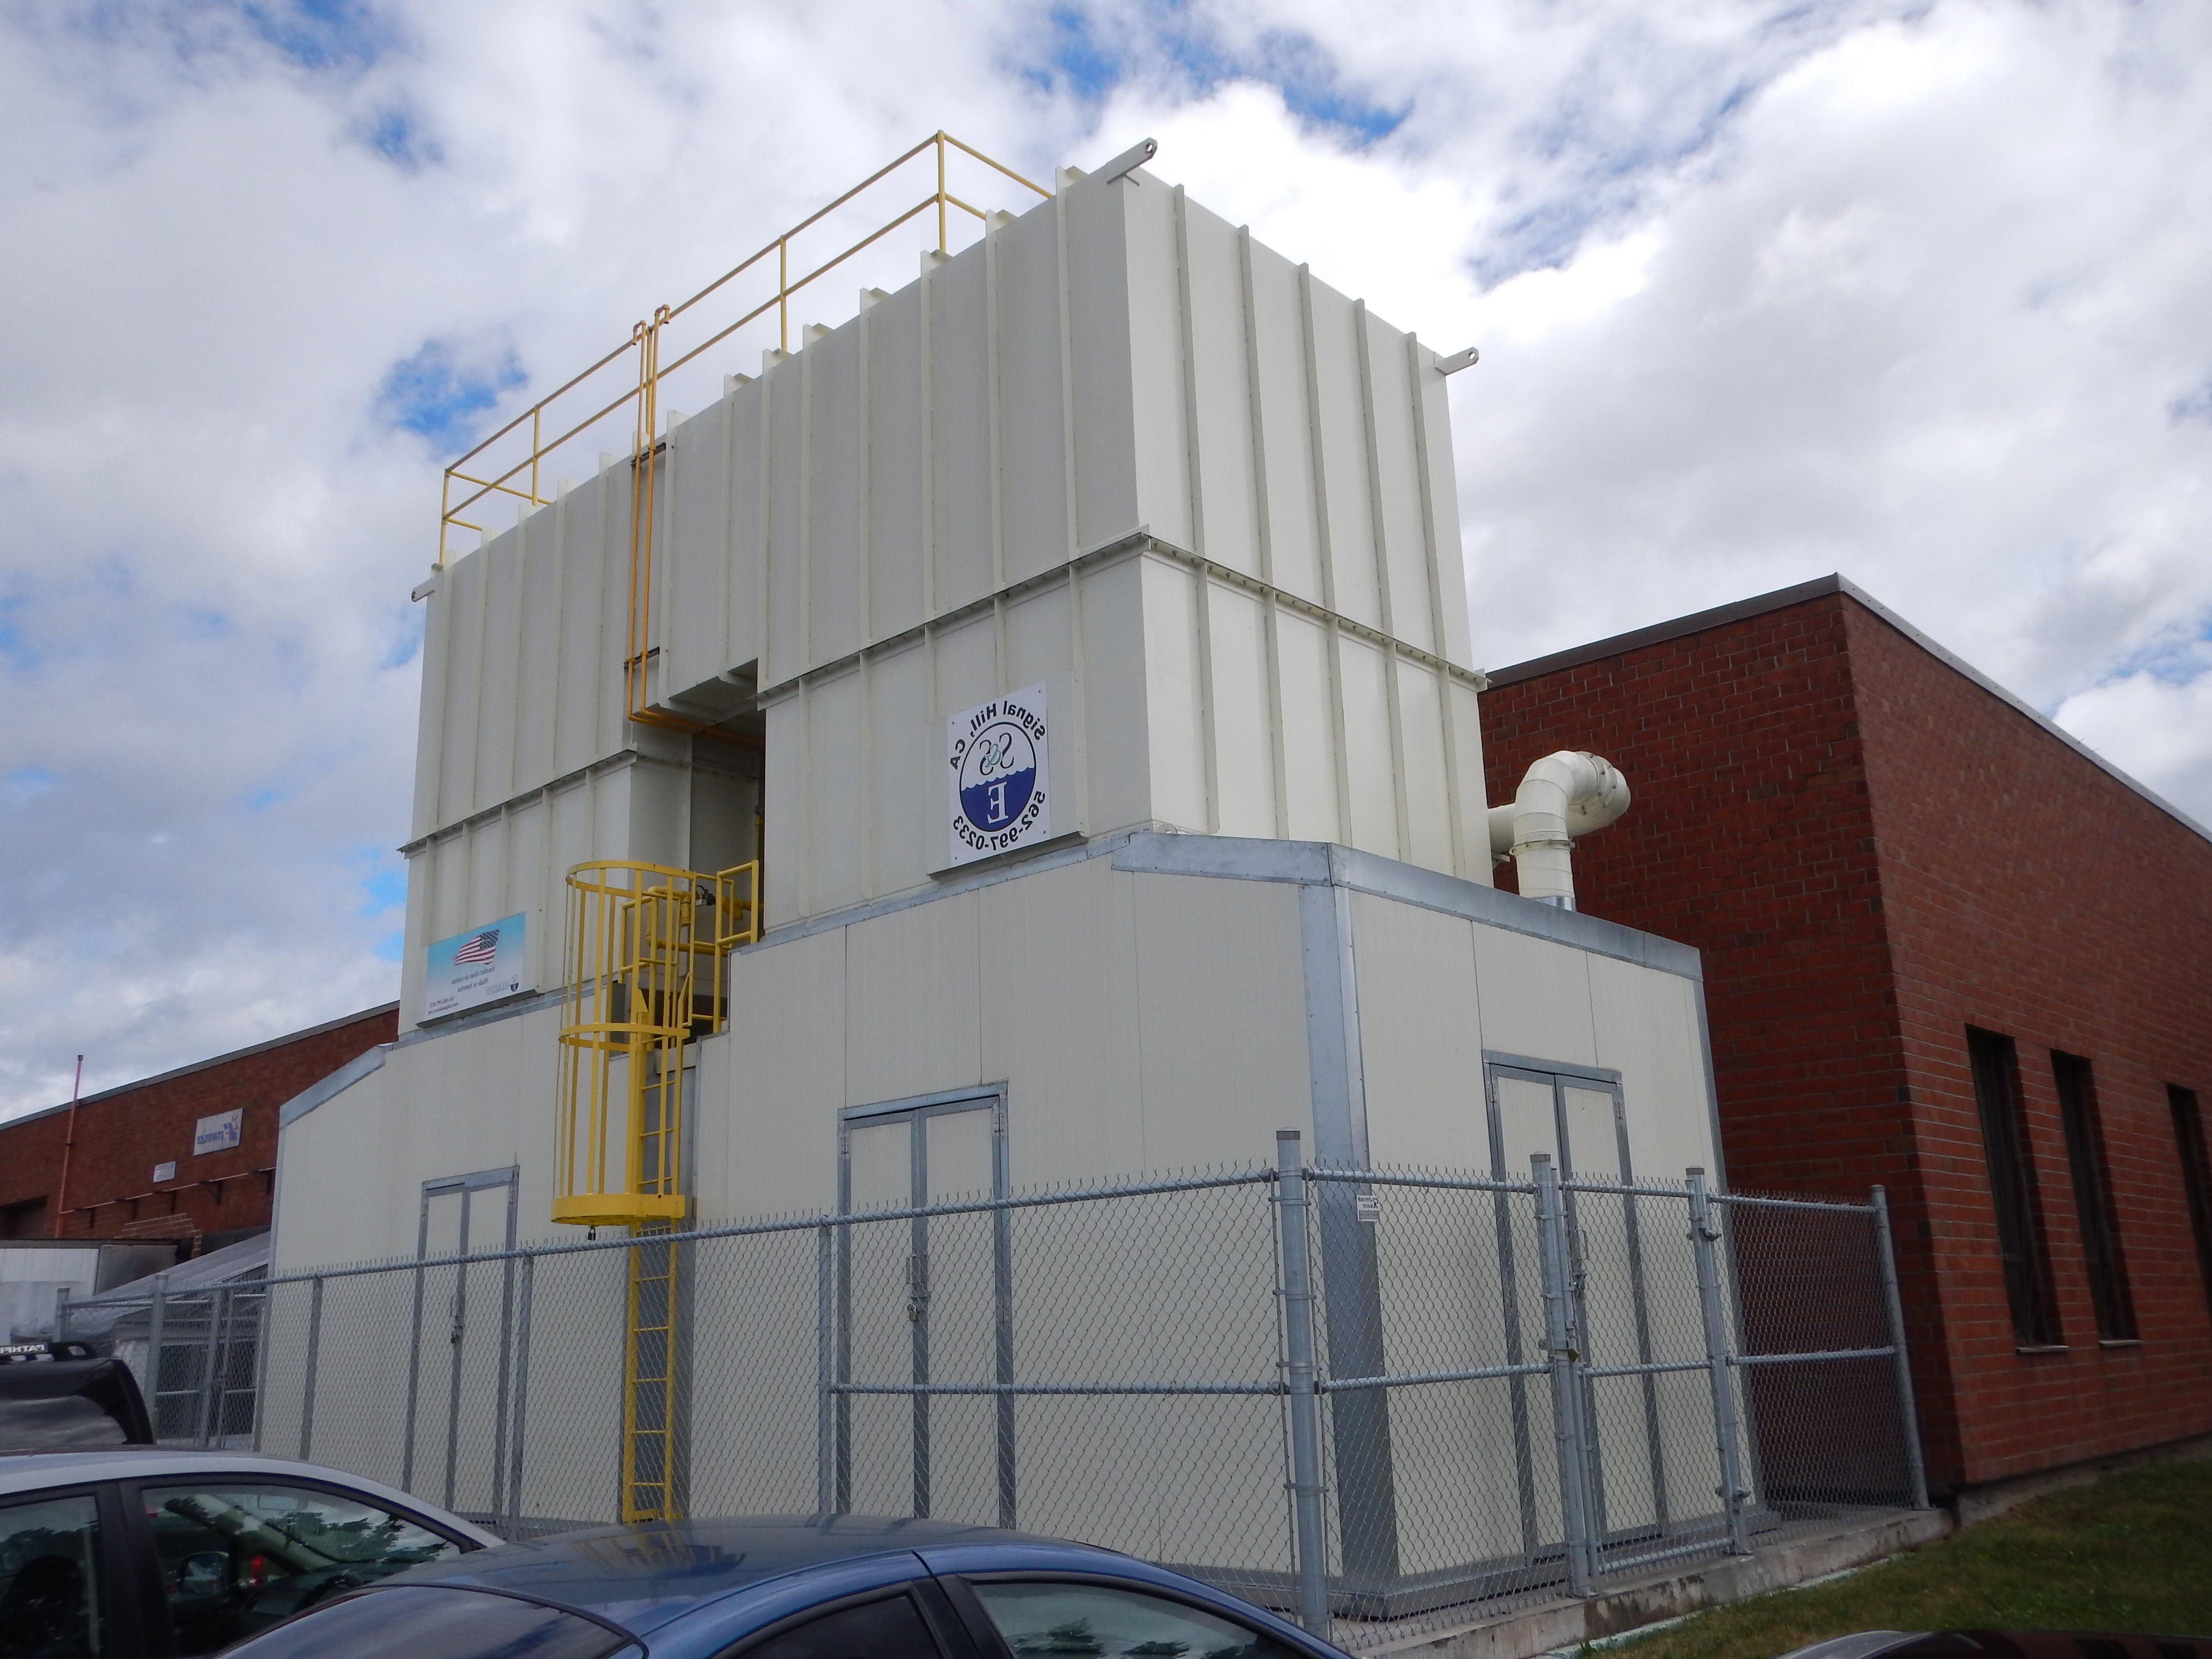 33,000 SCFM再生热氧化剂